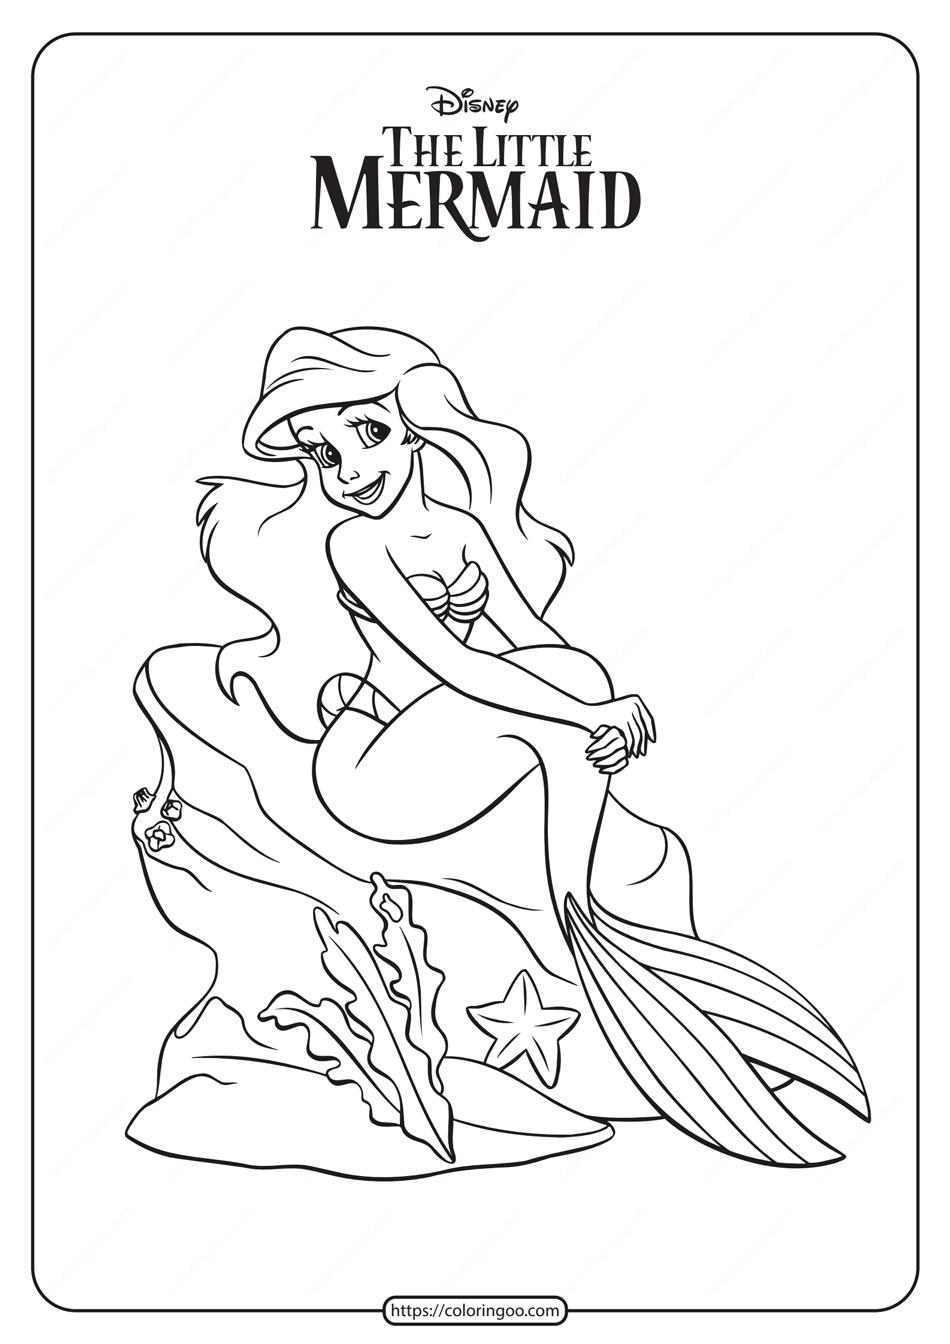 Printable The Little Mermaid Princess Ariel Coloring